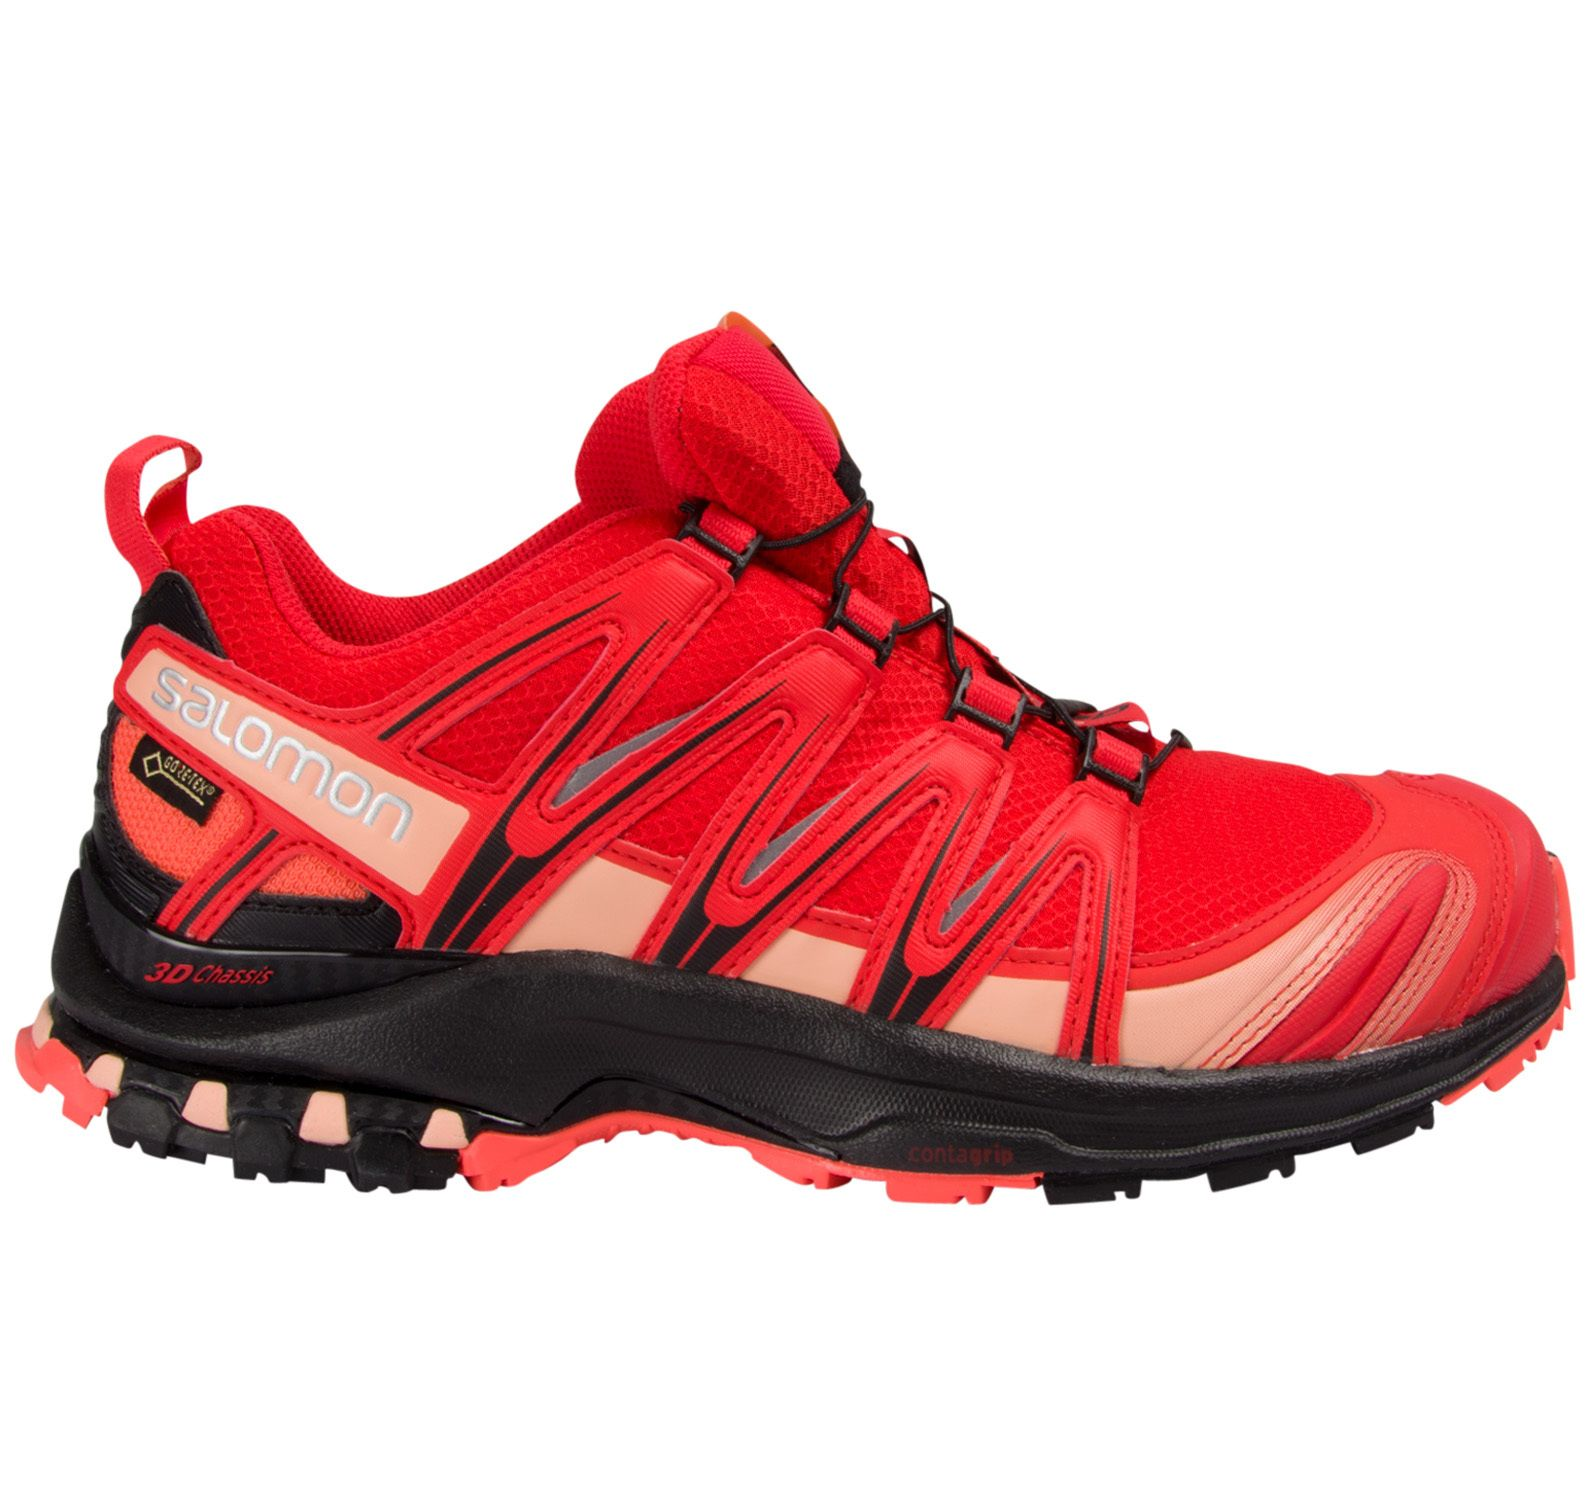 Xa Pro 3d Gtx® W, Poppy Red/ Black/ Living Coral, 36